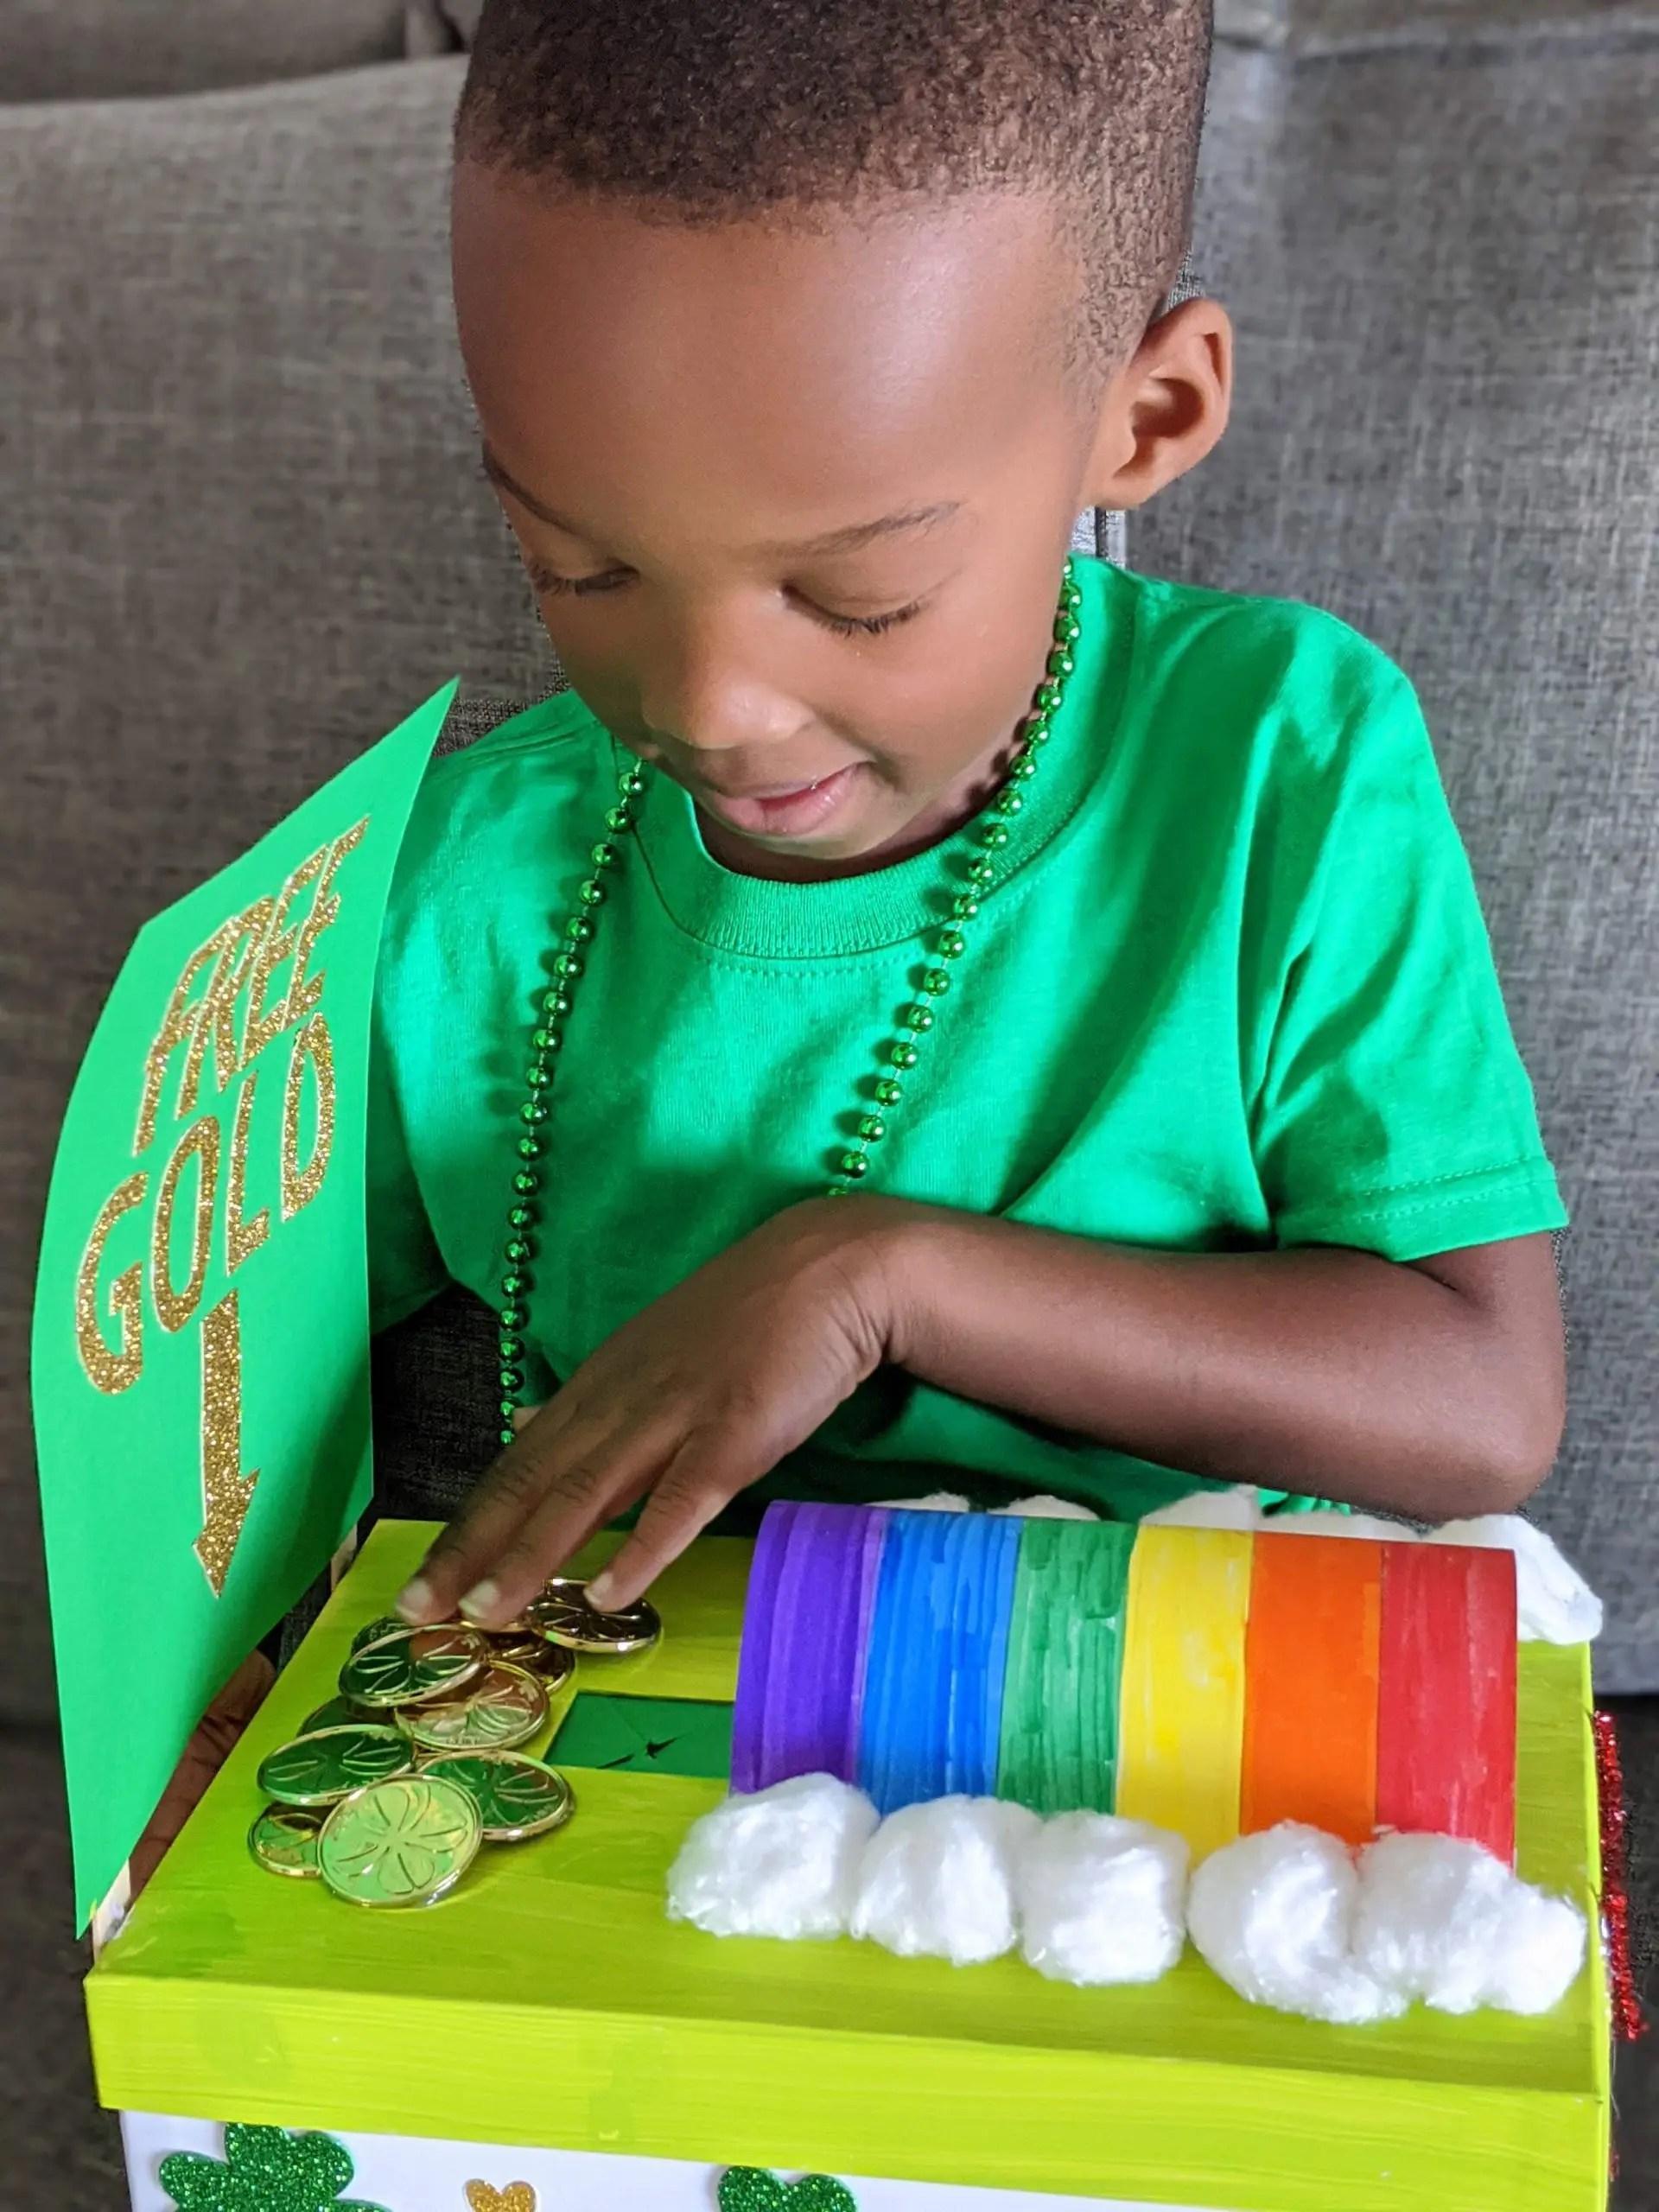 preschooler holding leprechaun trap